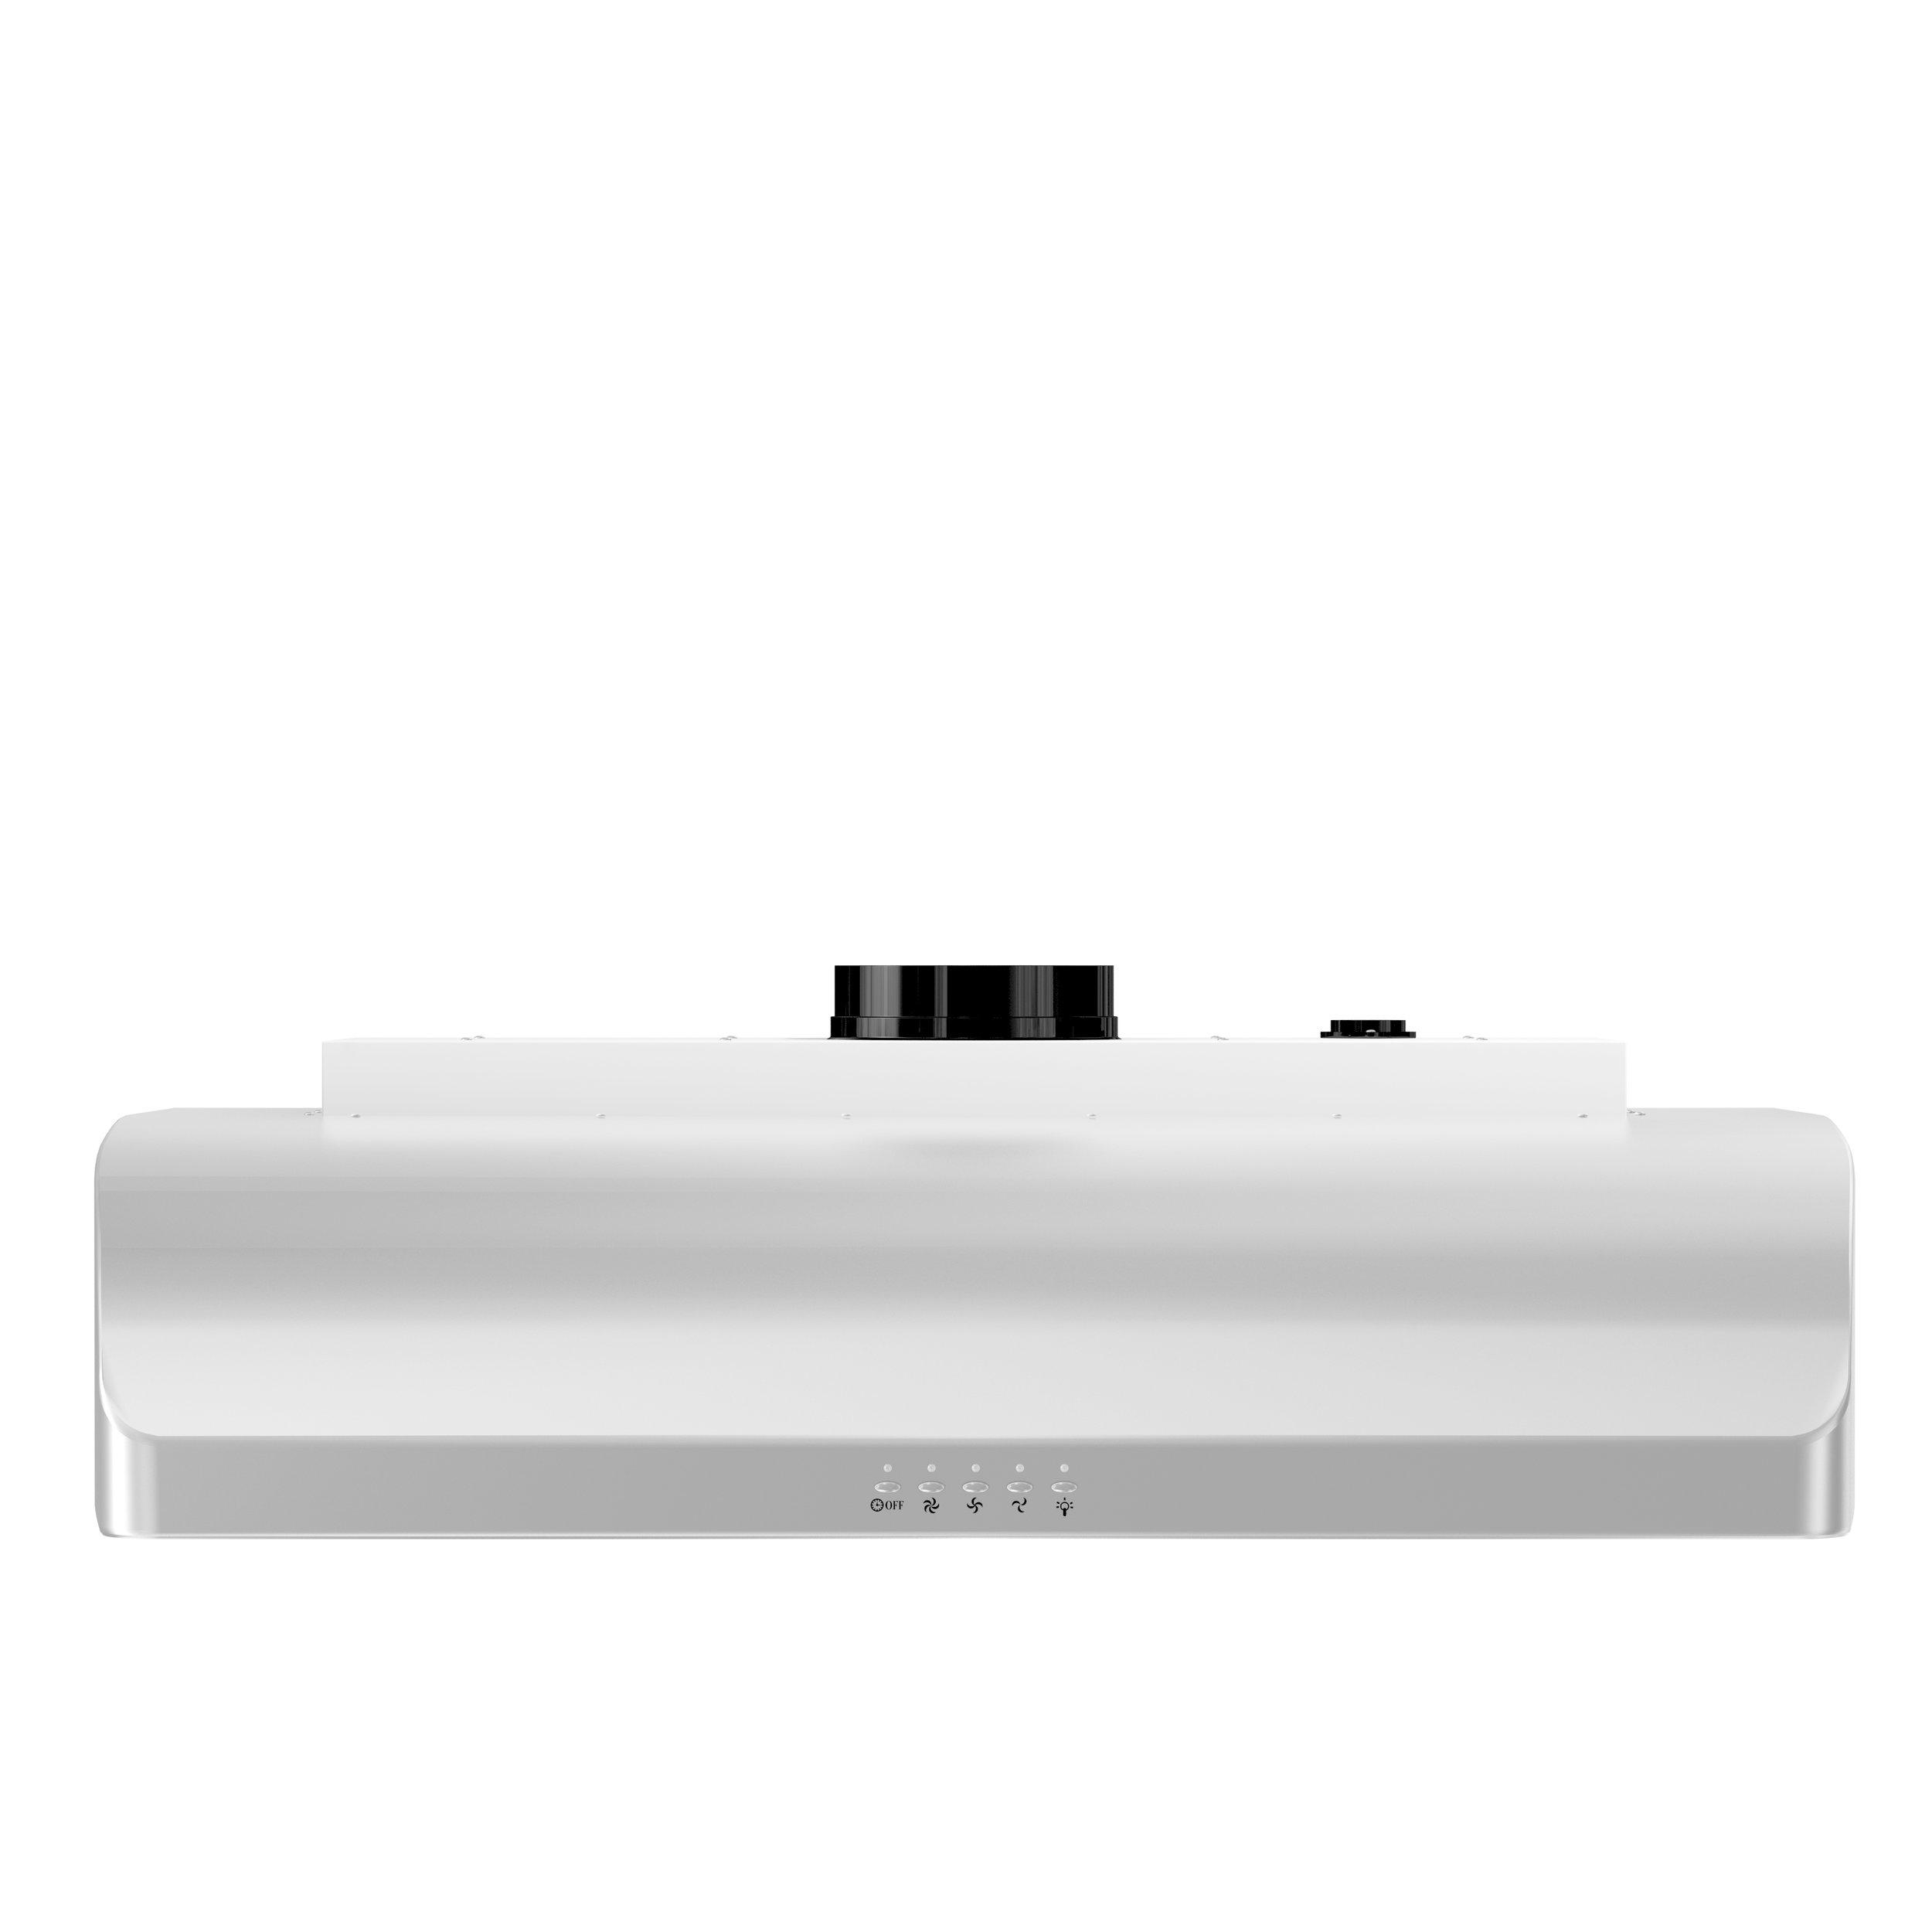 zline-stainless-steel-under-cabinet-range-hood-625-front.jpeg